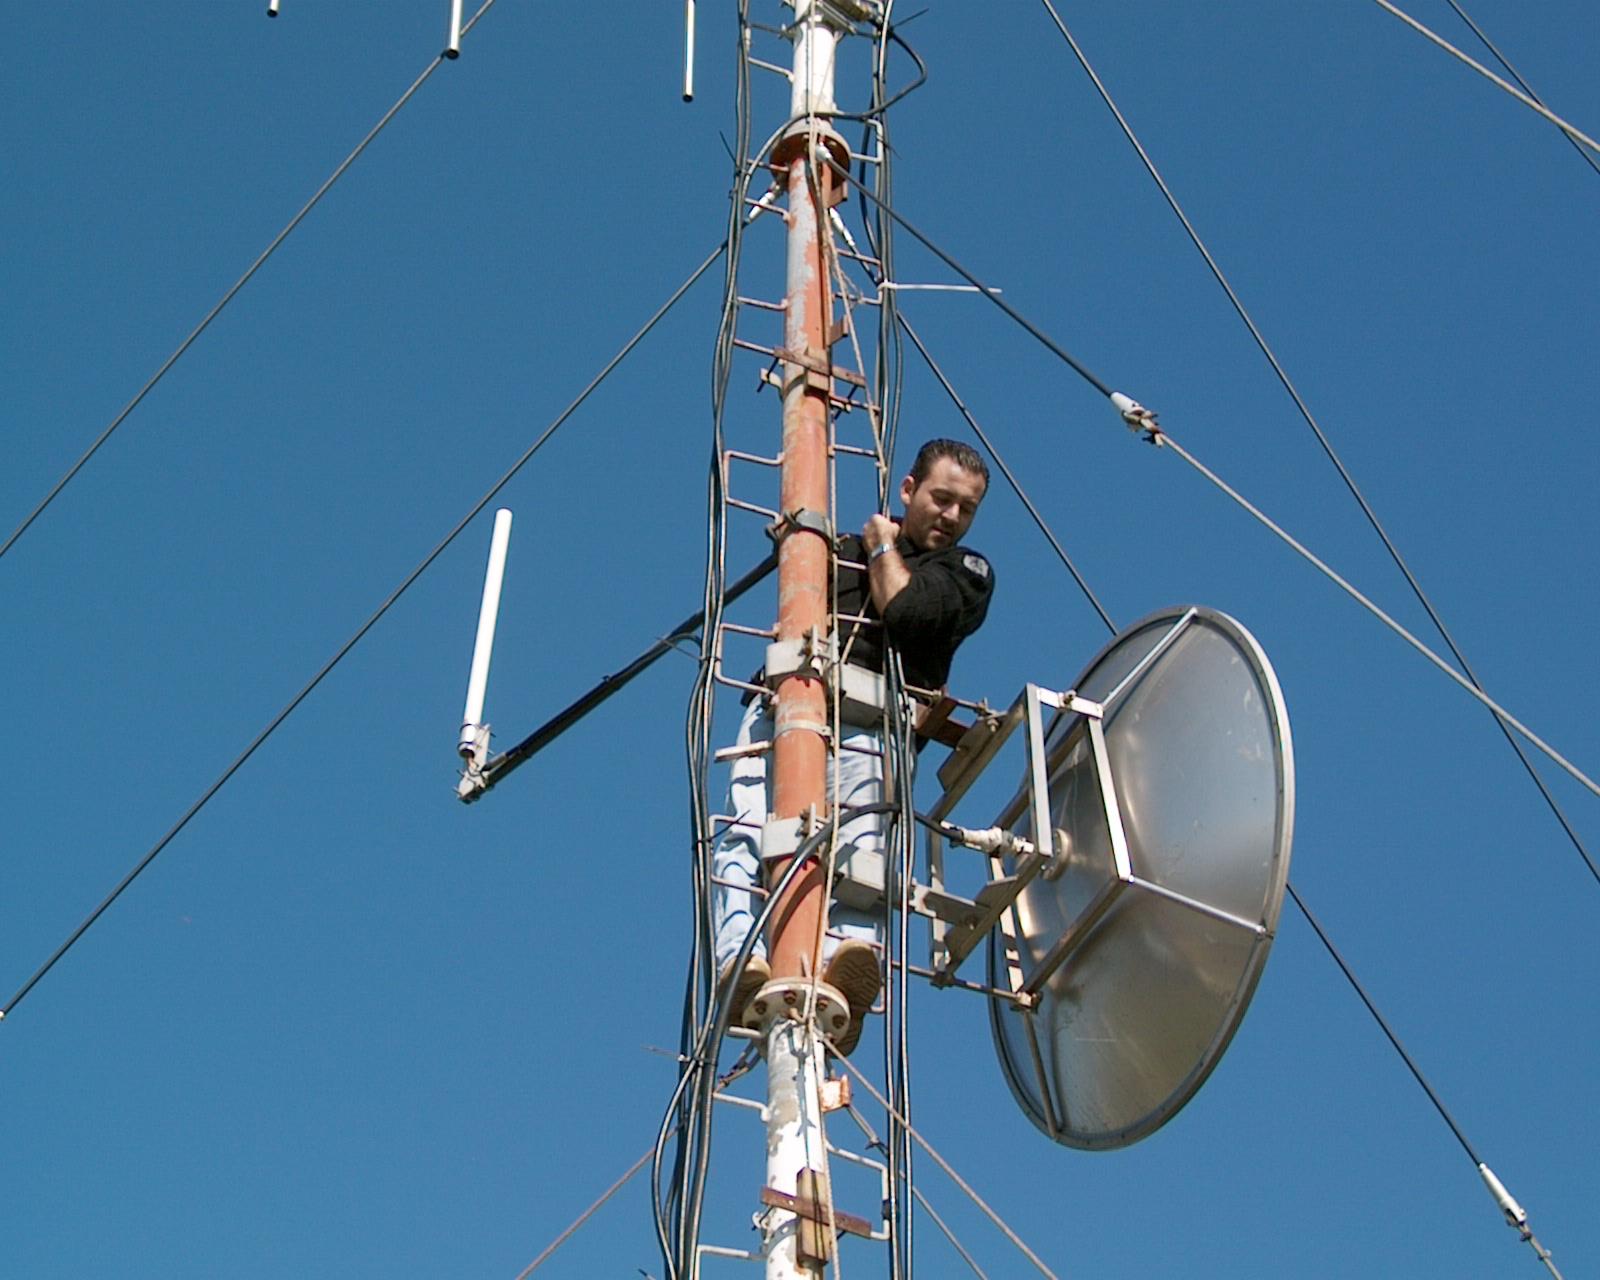 Essential Electronic Test & Measurement Equipment